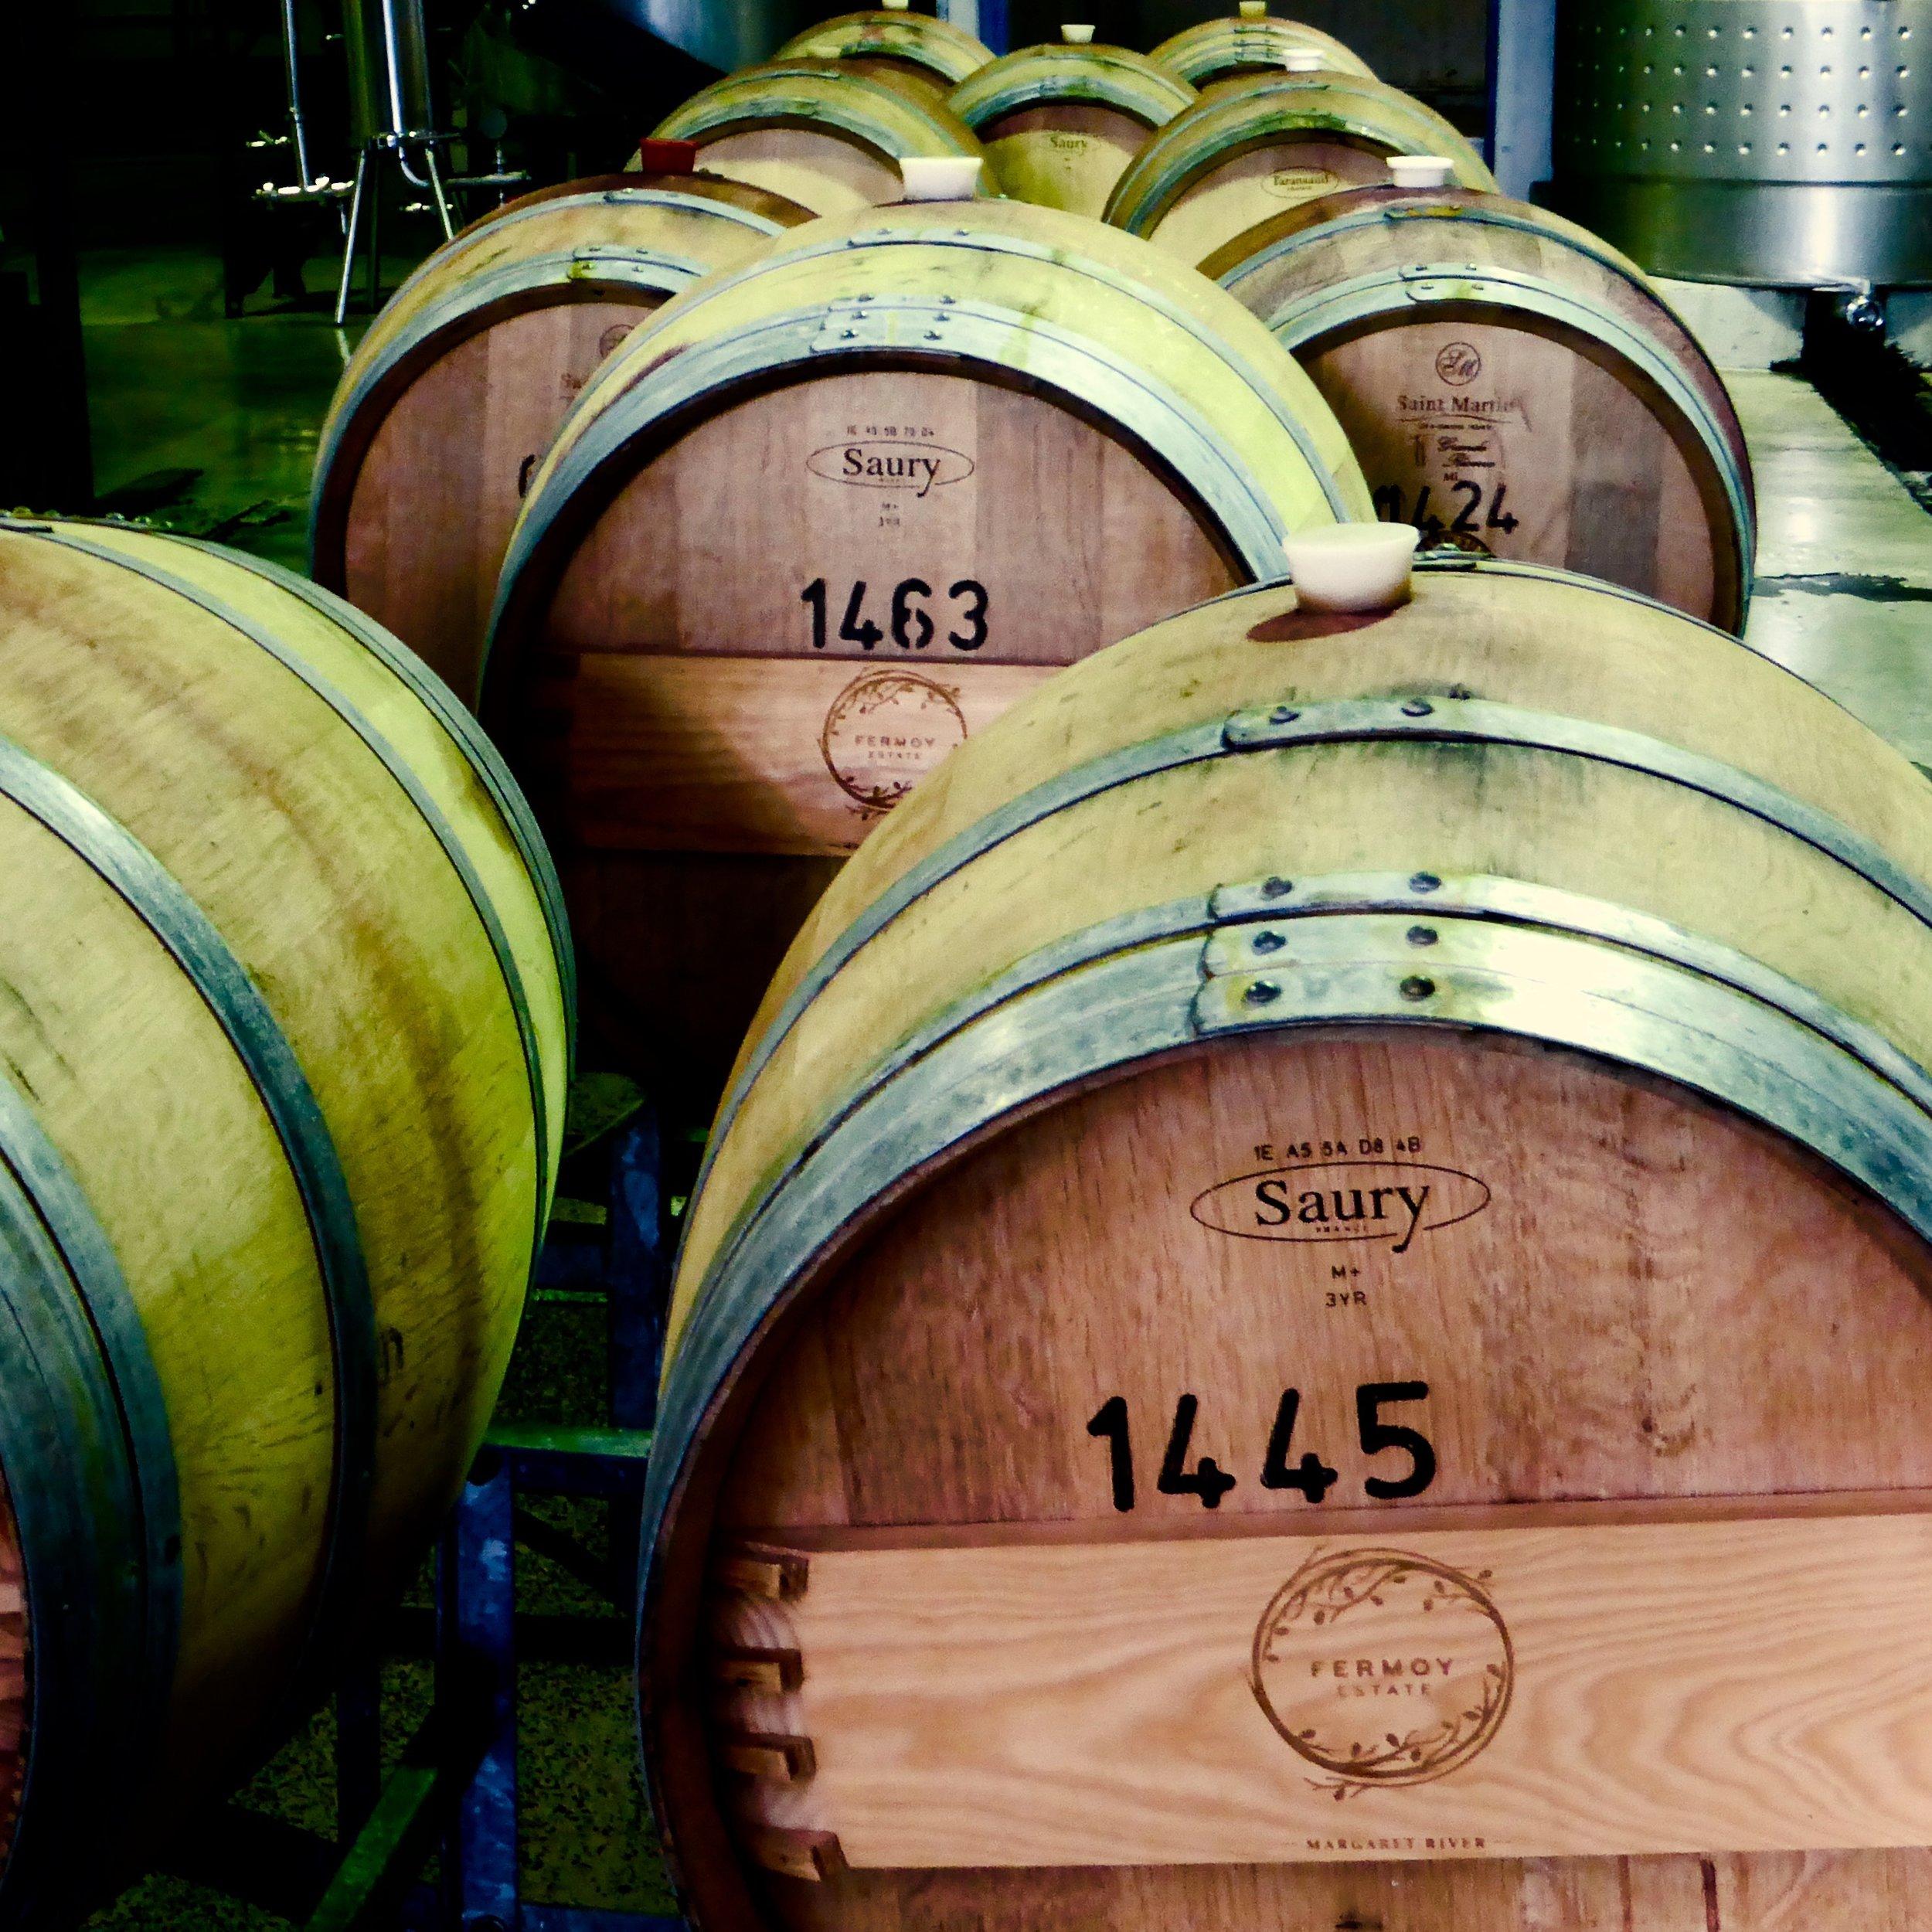 Wine barrels, Margaret River, Western Australia @acrosslandsea